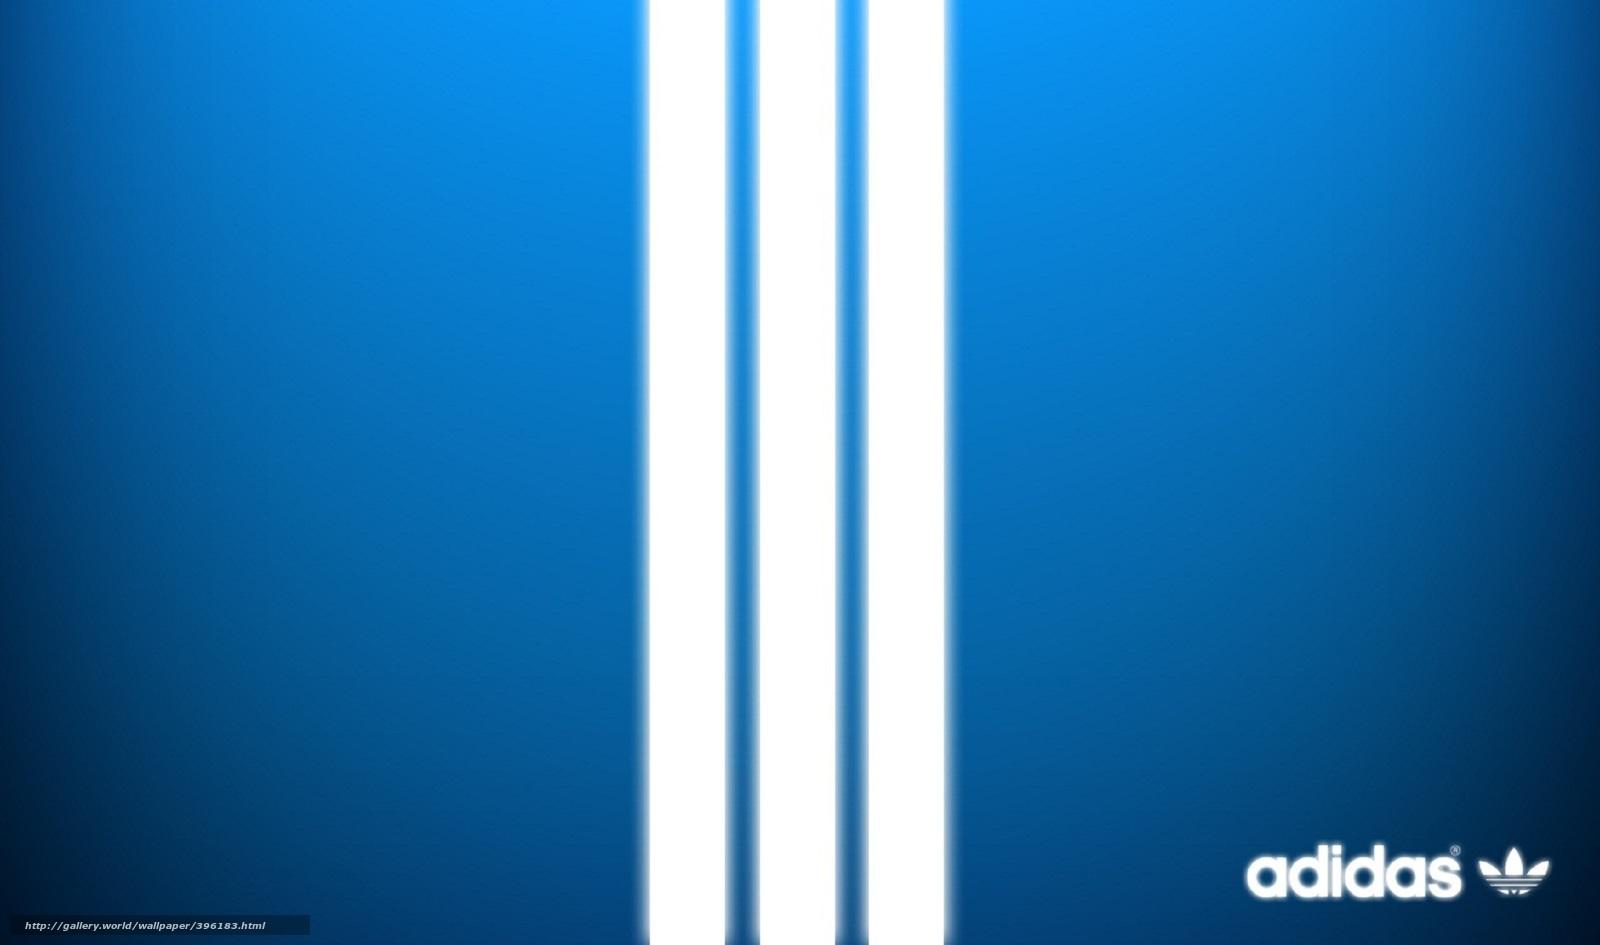 adidas fondo azul